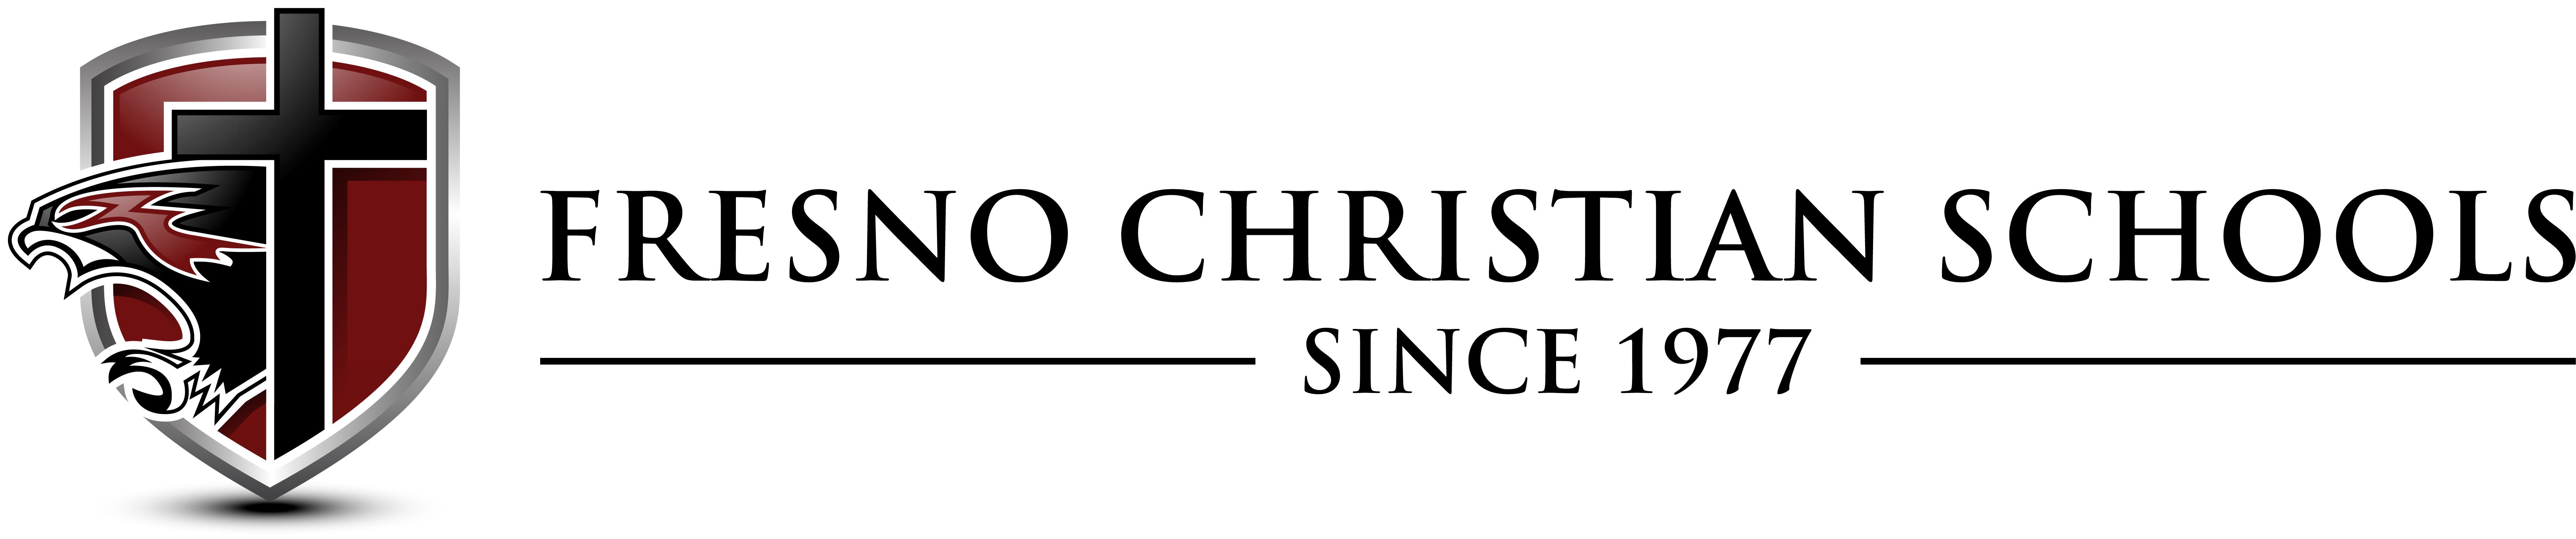 Fresno Christian Schools Retina Logo